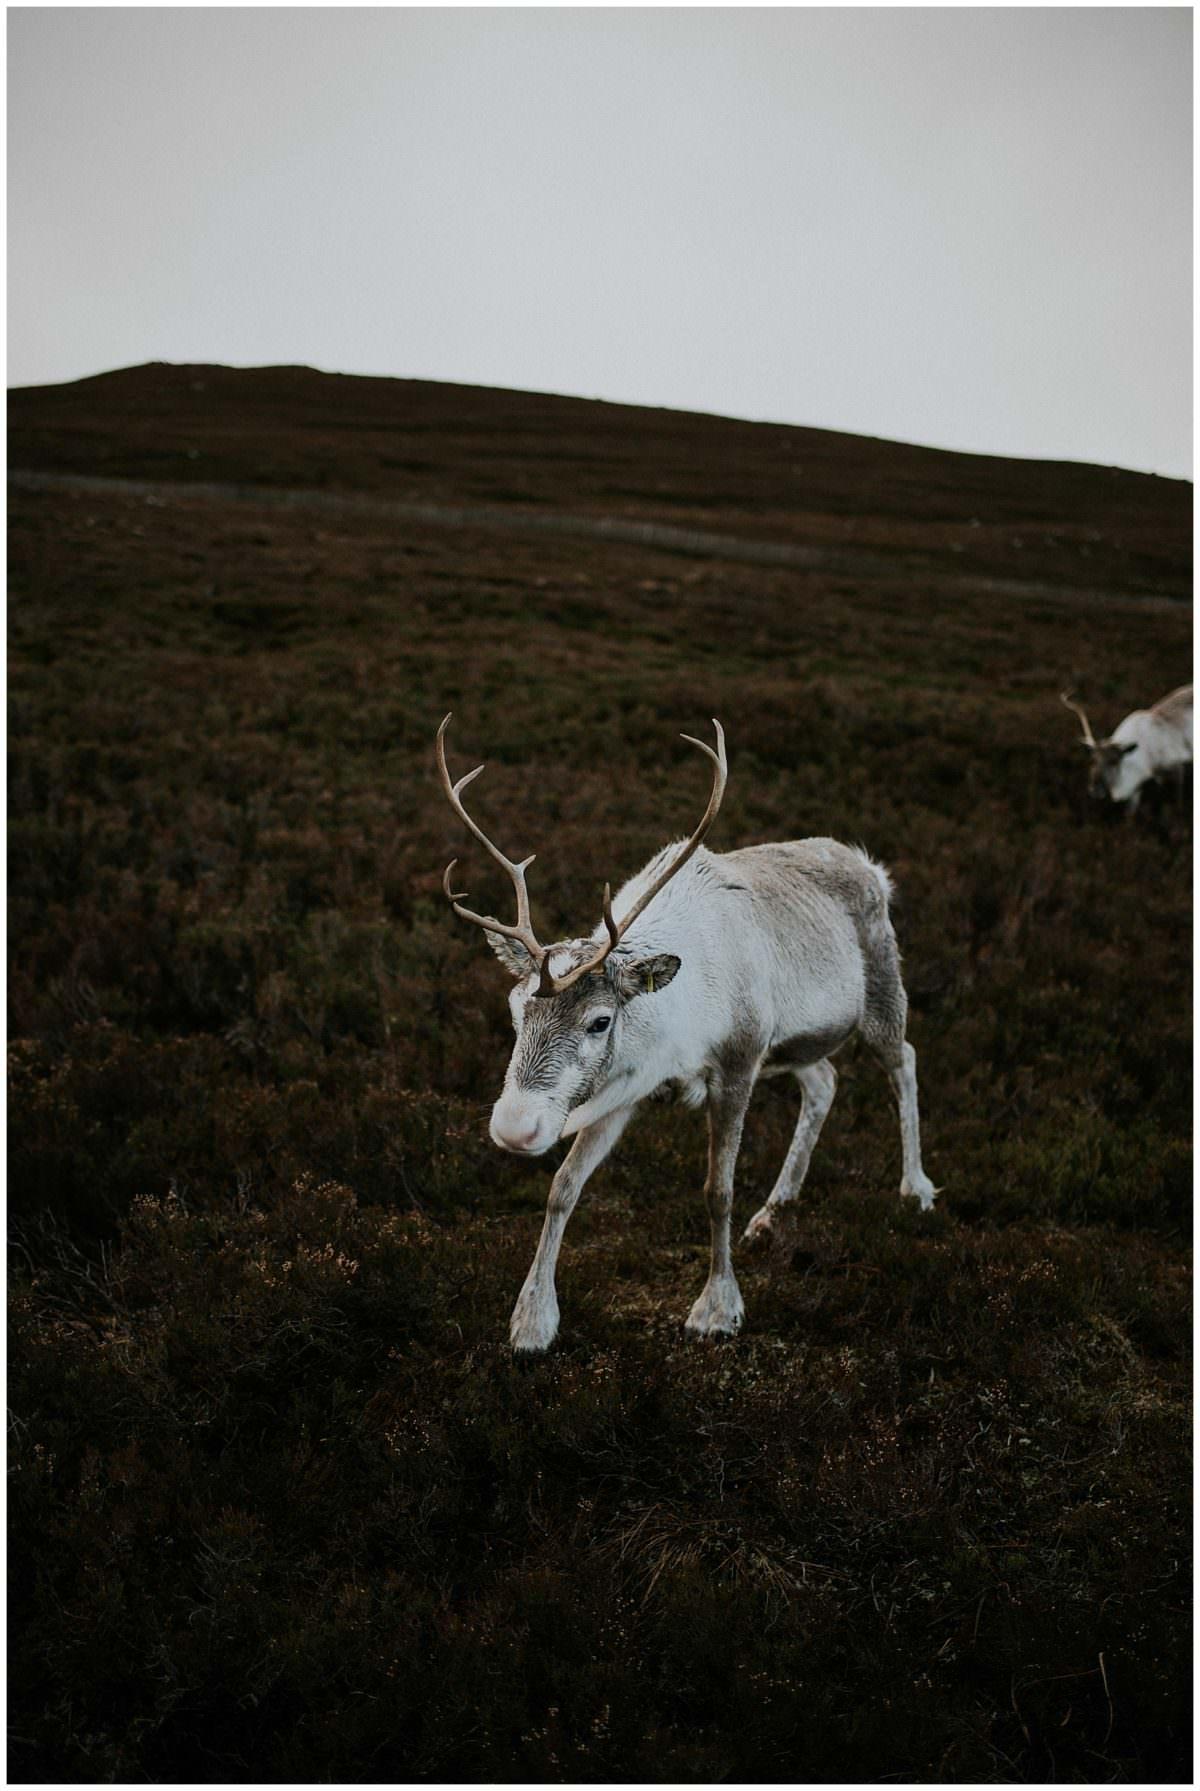 Reindeer in Scotland - Reindeer Centre, Cairngorms National Park